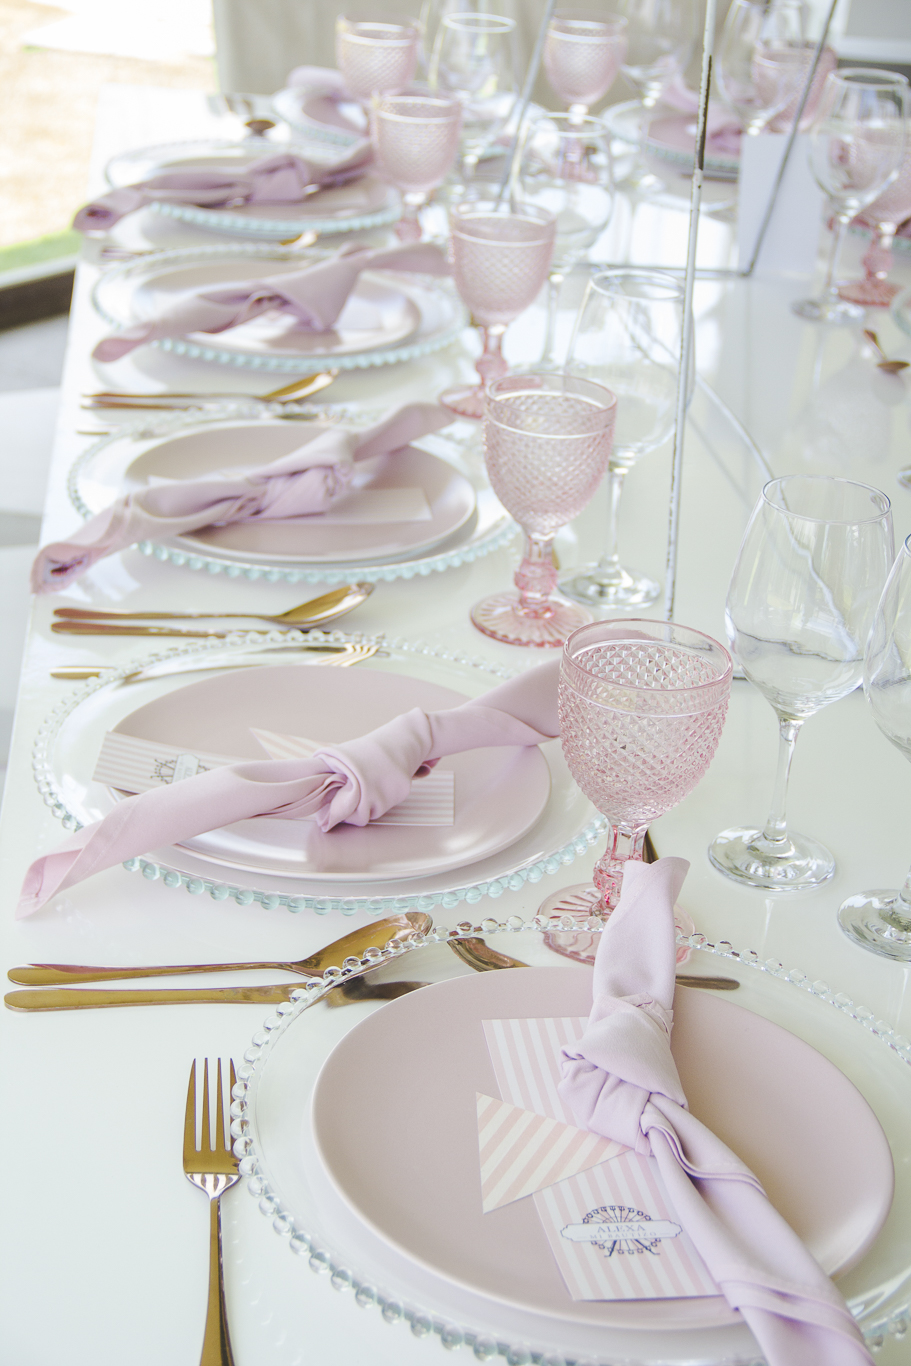 mgb-pink-3.jpg